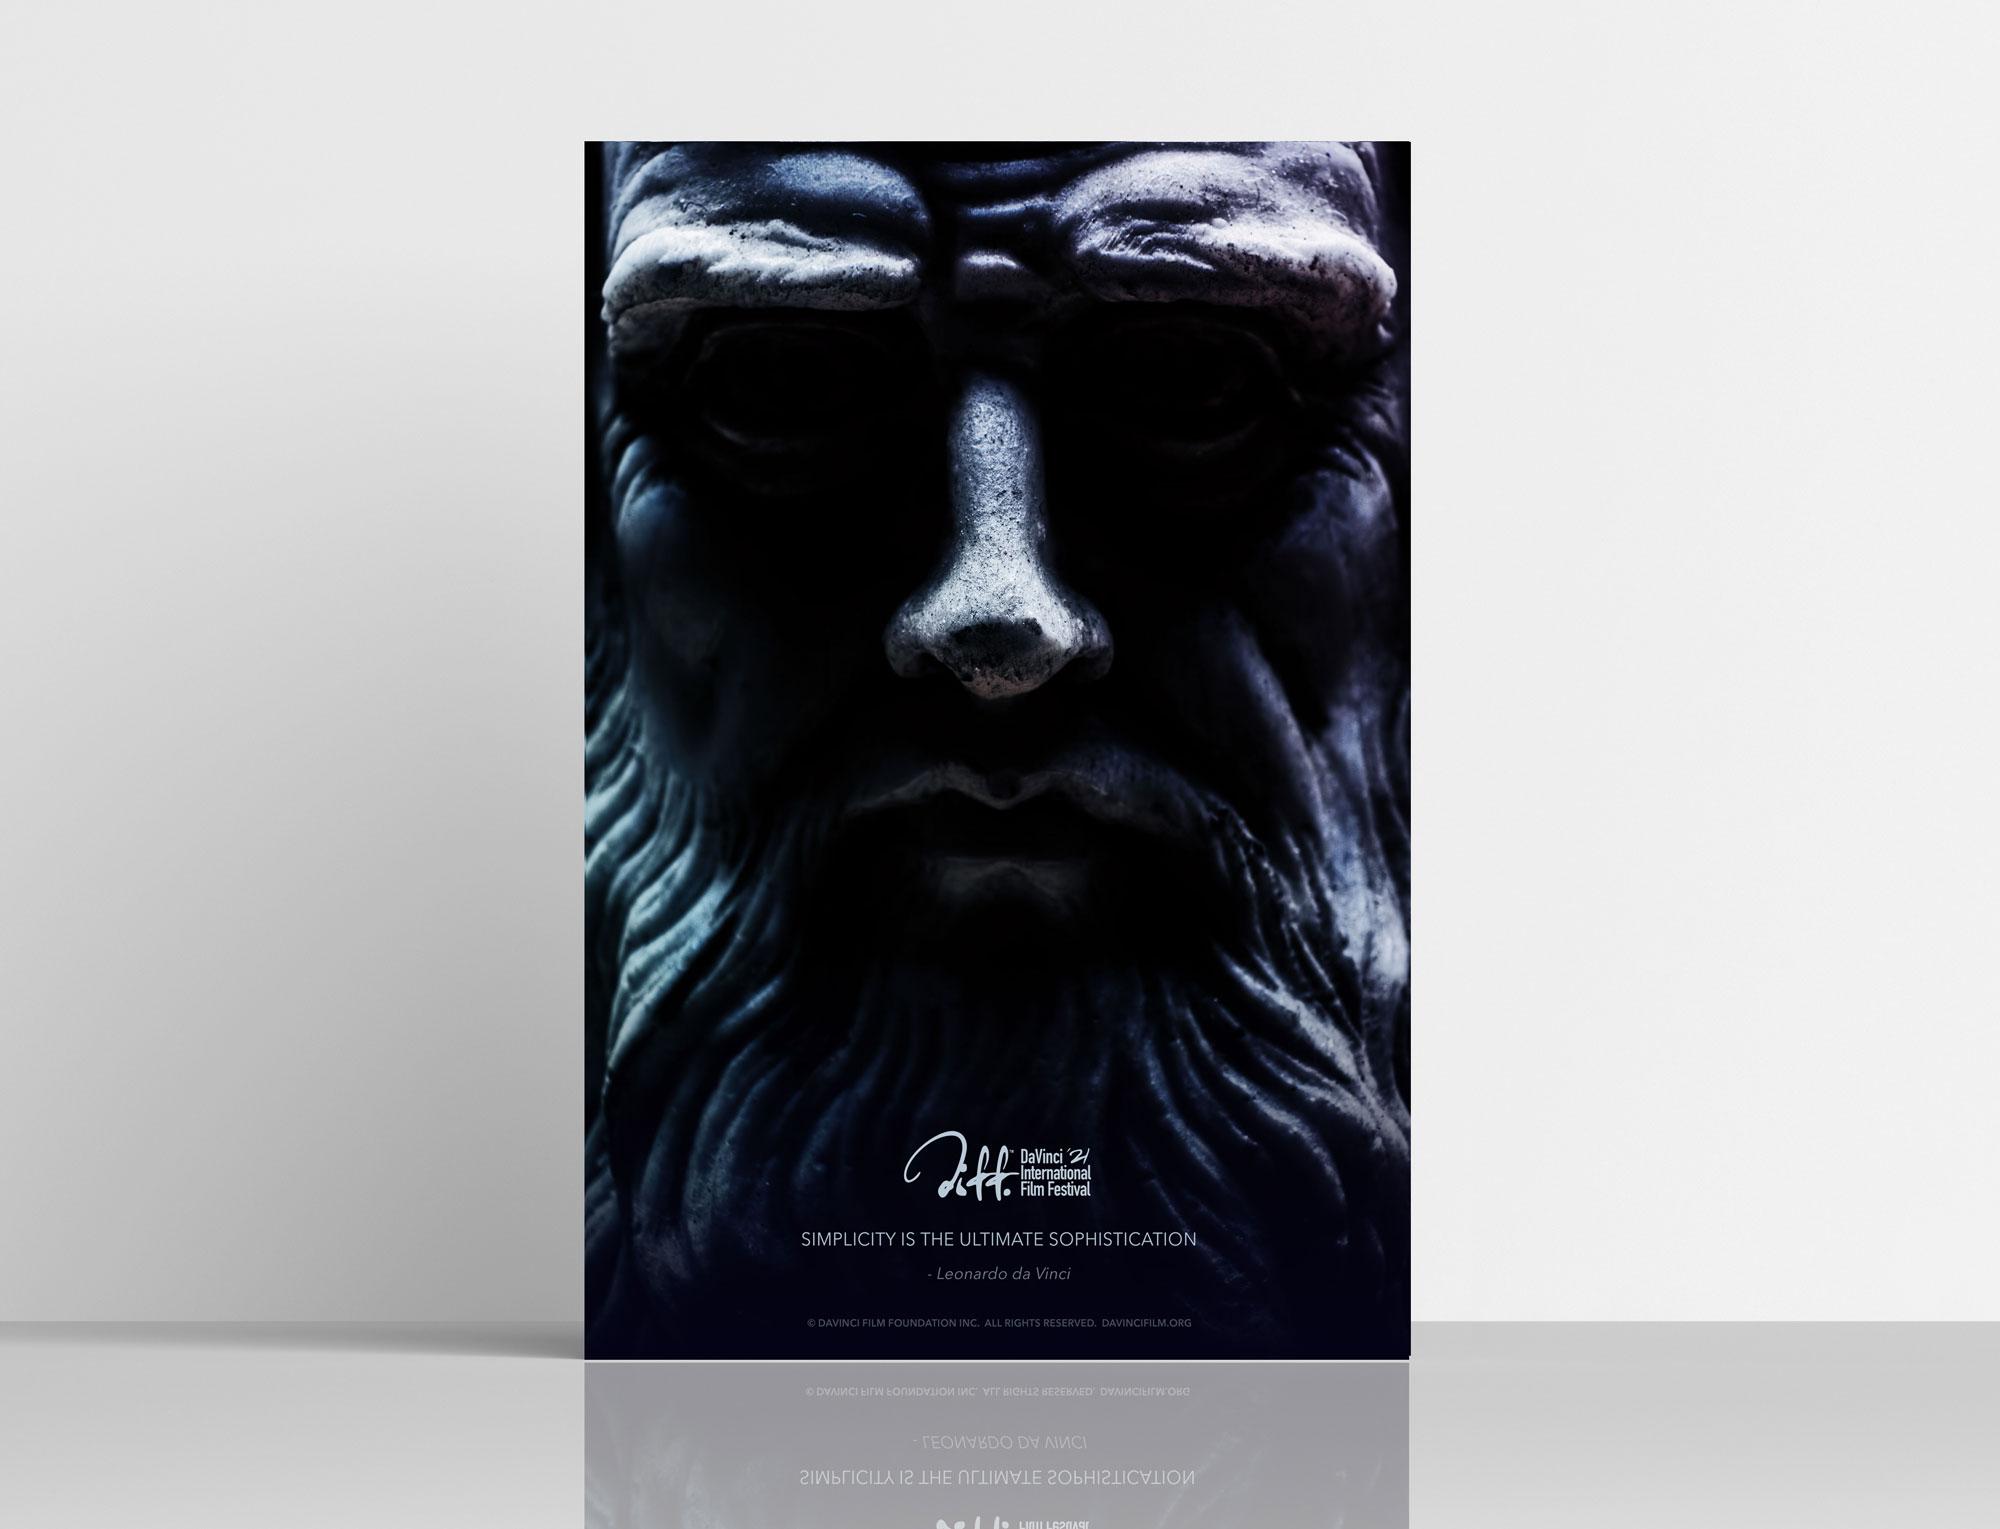 poster web 1 Official Poster DaVinci Film Festival